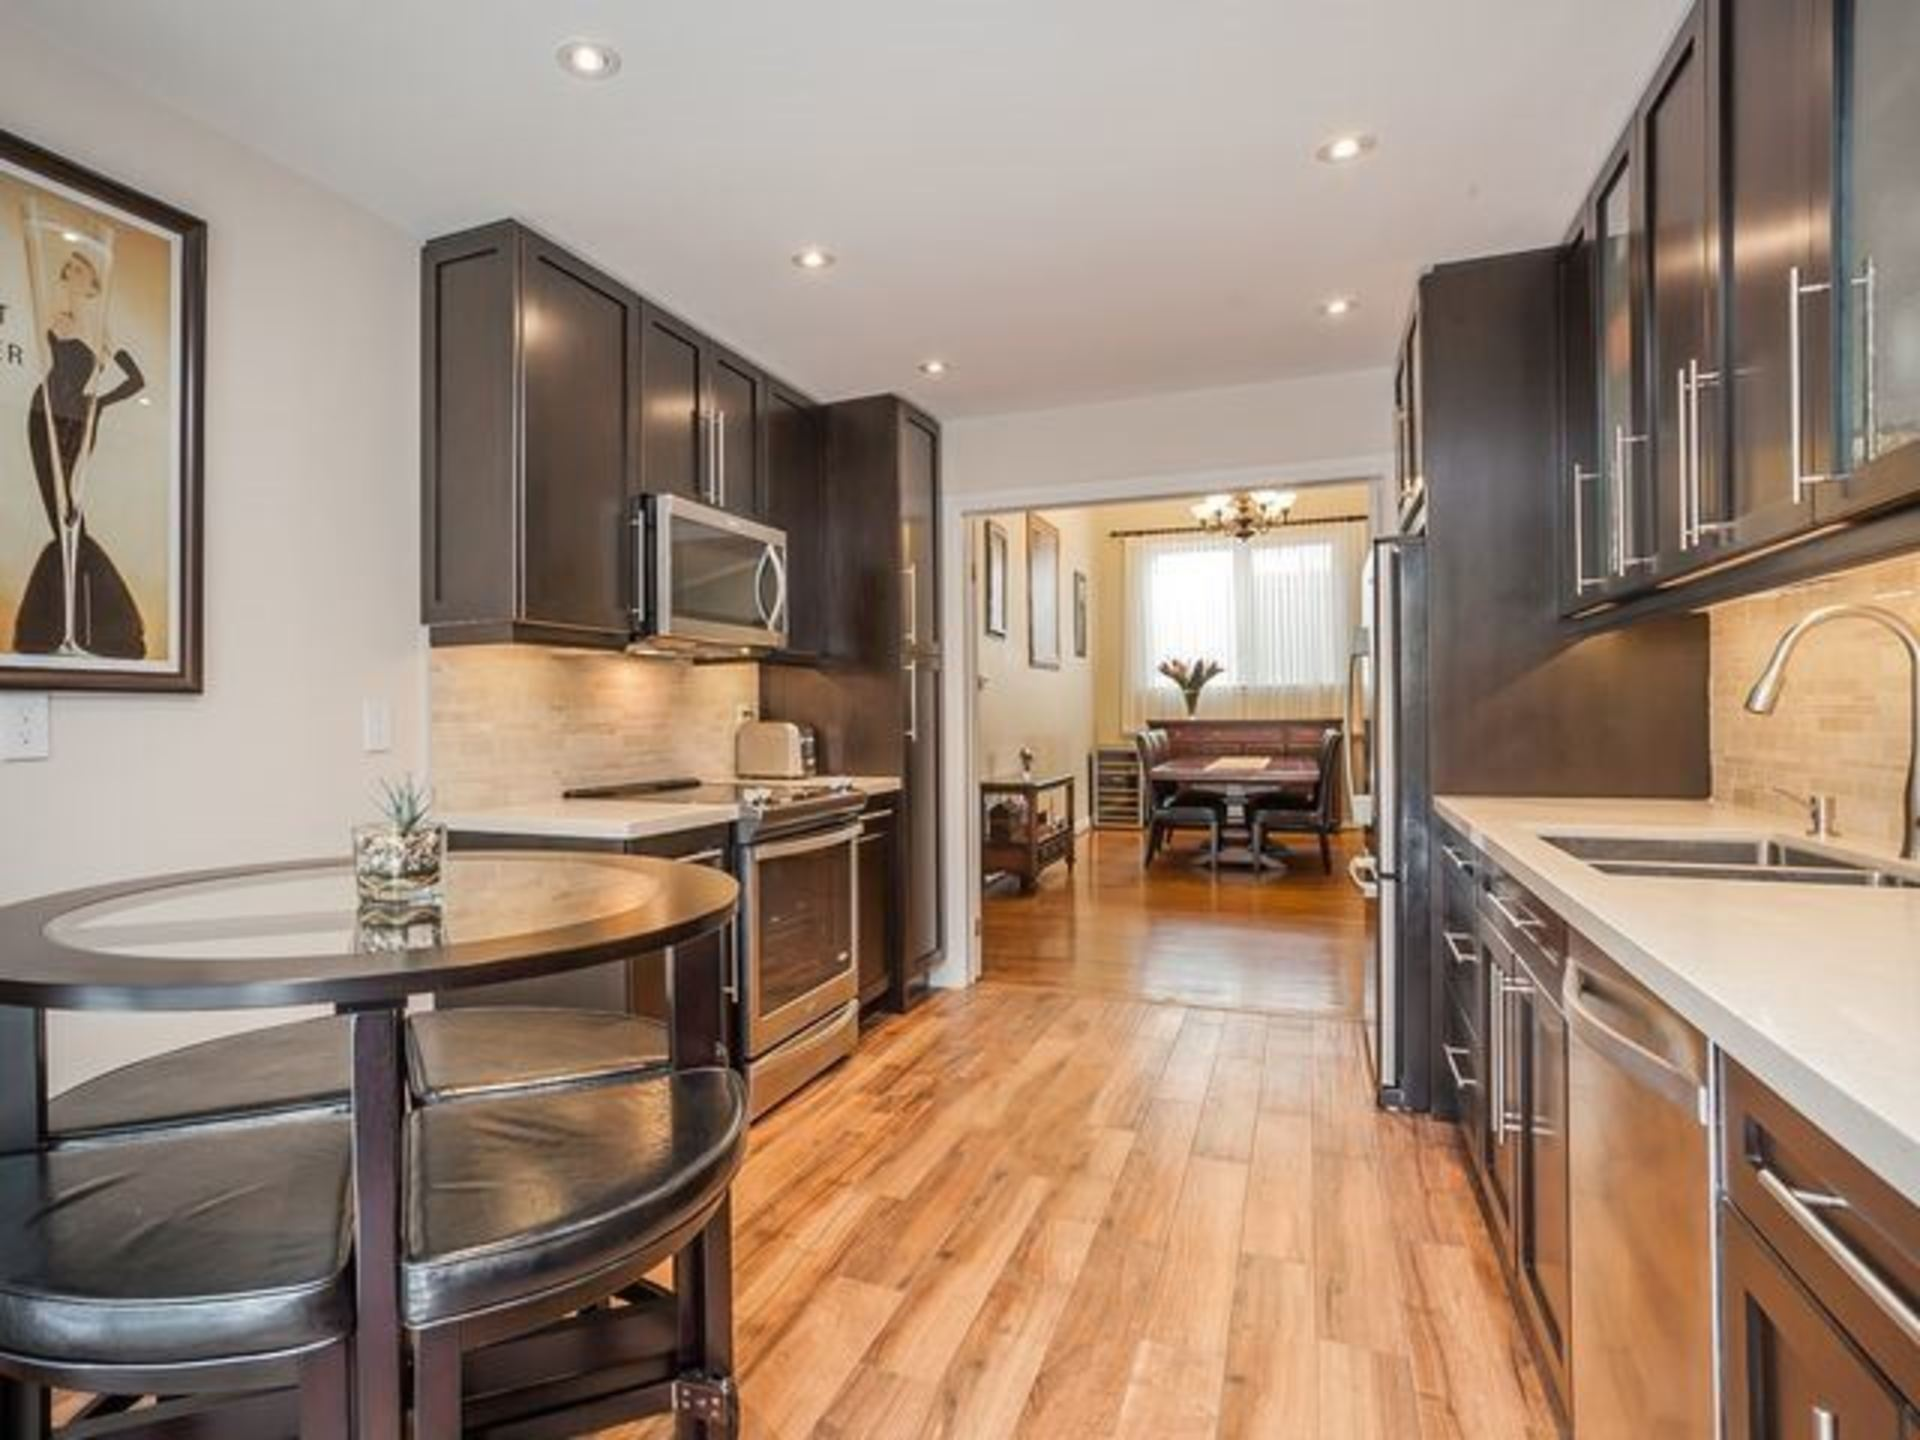 c3710018_5 at SALE # 453 - 56 Burbank Drive, Bayview Village, Toronto